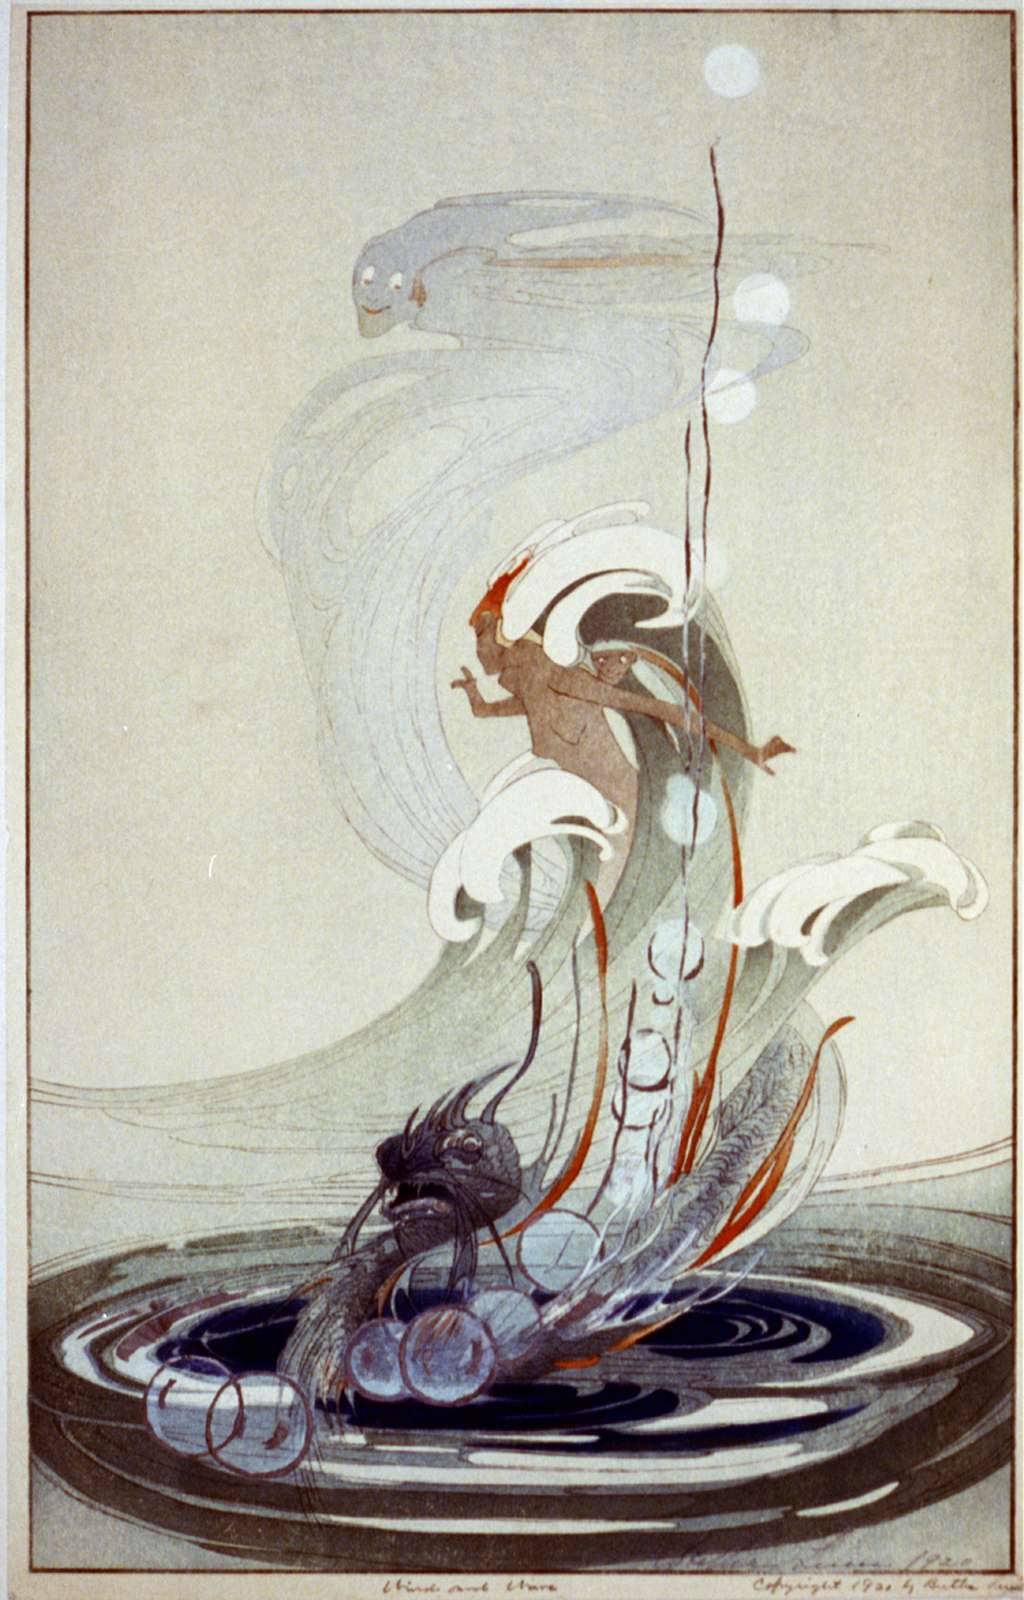 Wind and wave / Bertha Lum